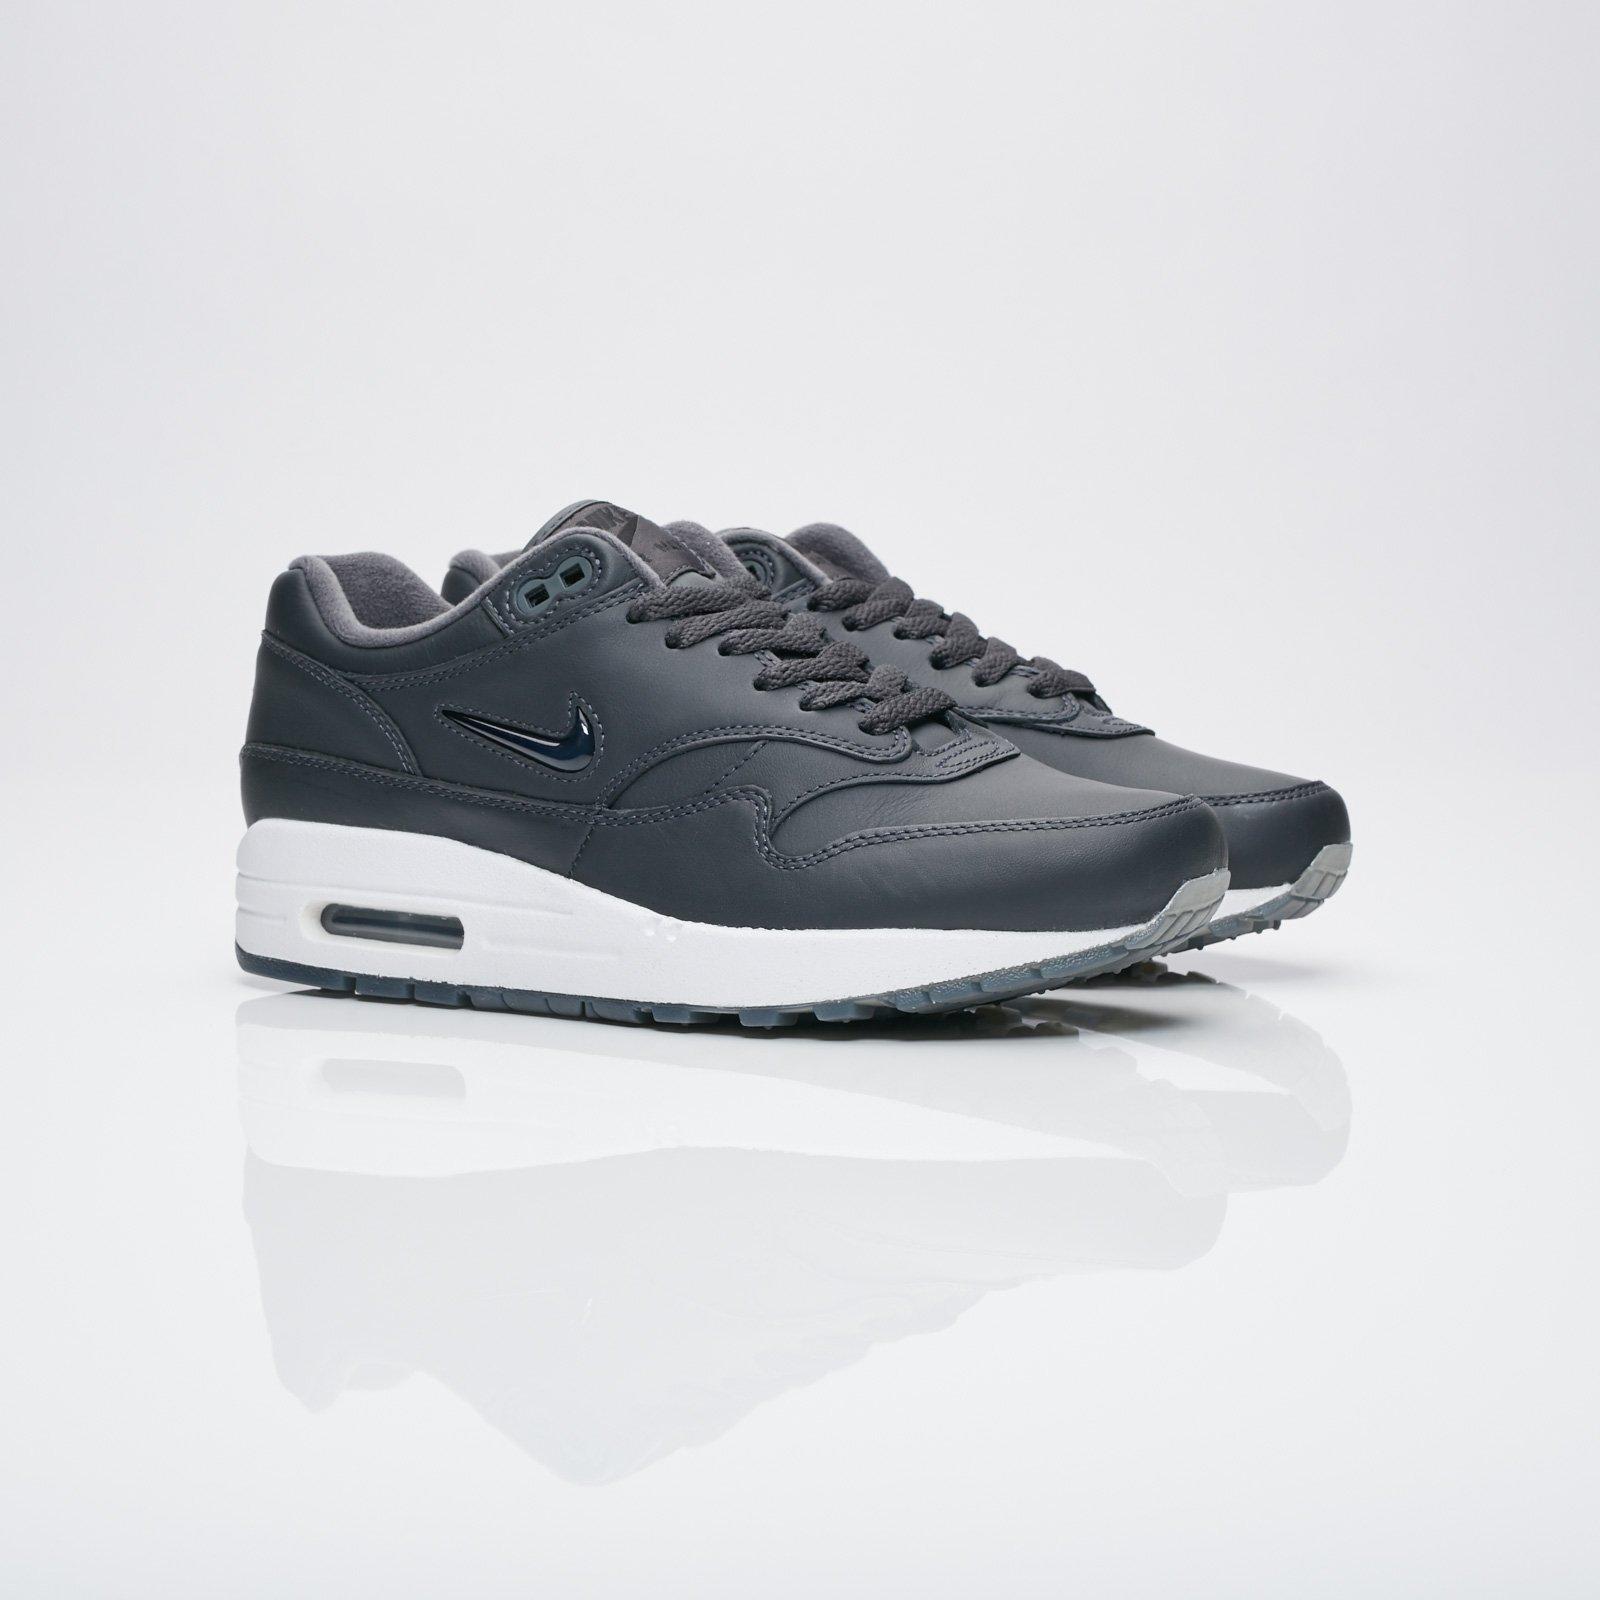 Nike Wmns Air Max 1 Premium SC Aa0512 003 Sneakersnstuff